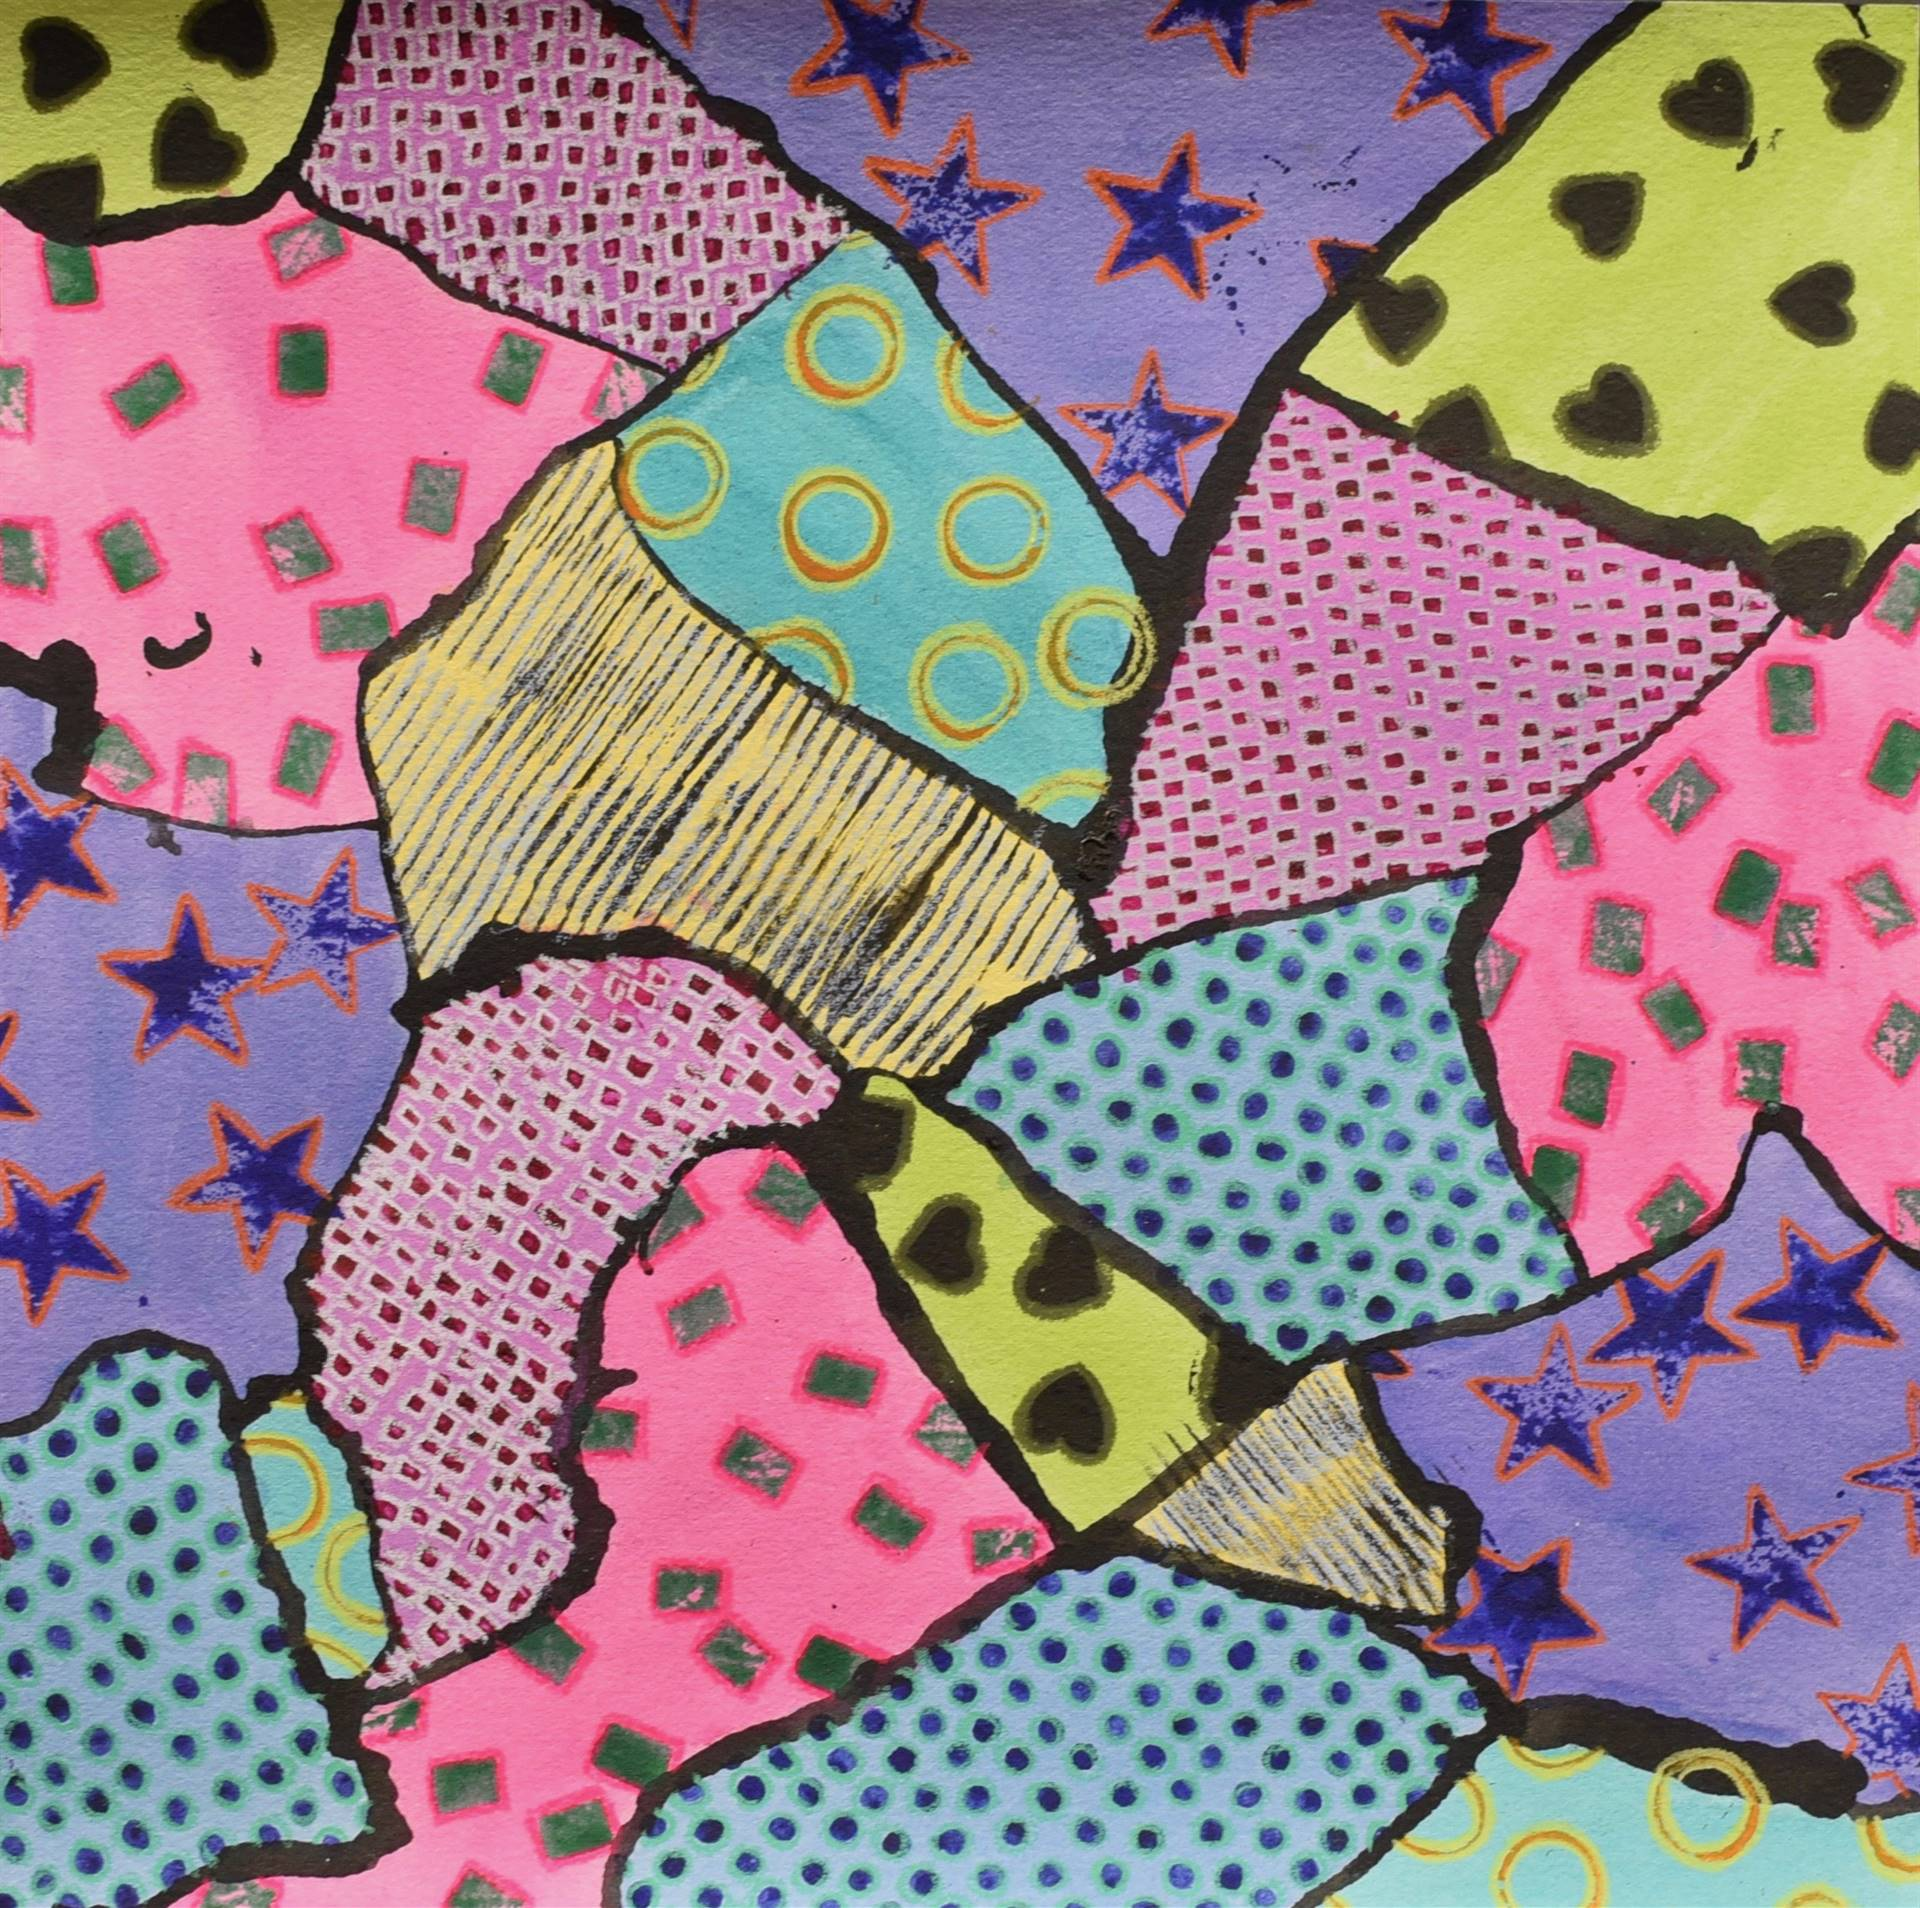 Brecksville-Broadview Hts. Middle School Art Projects 48